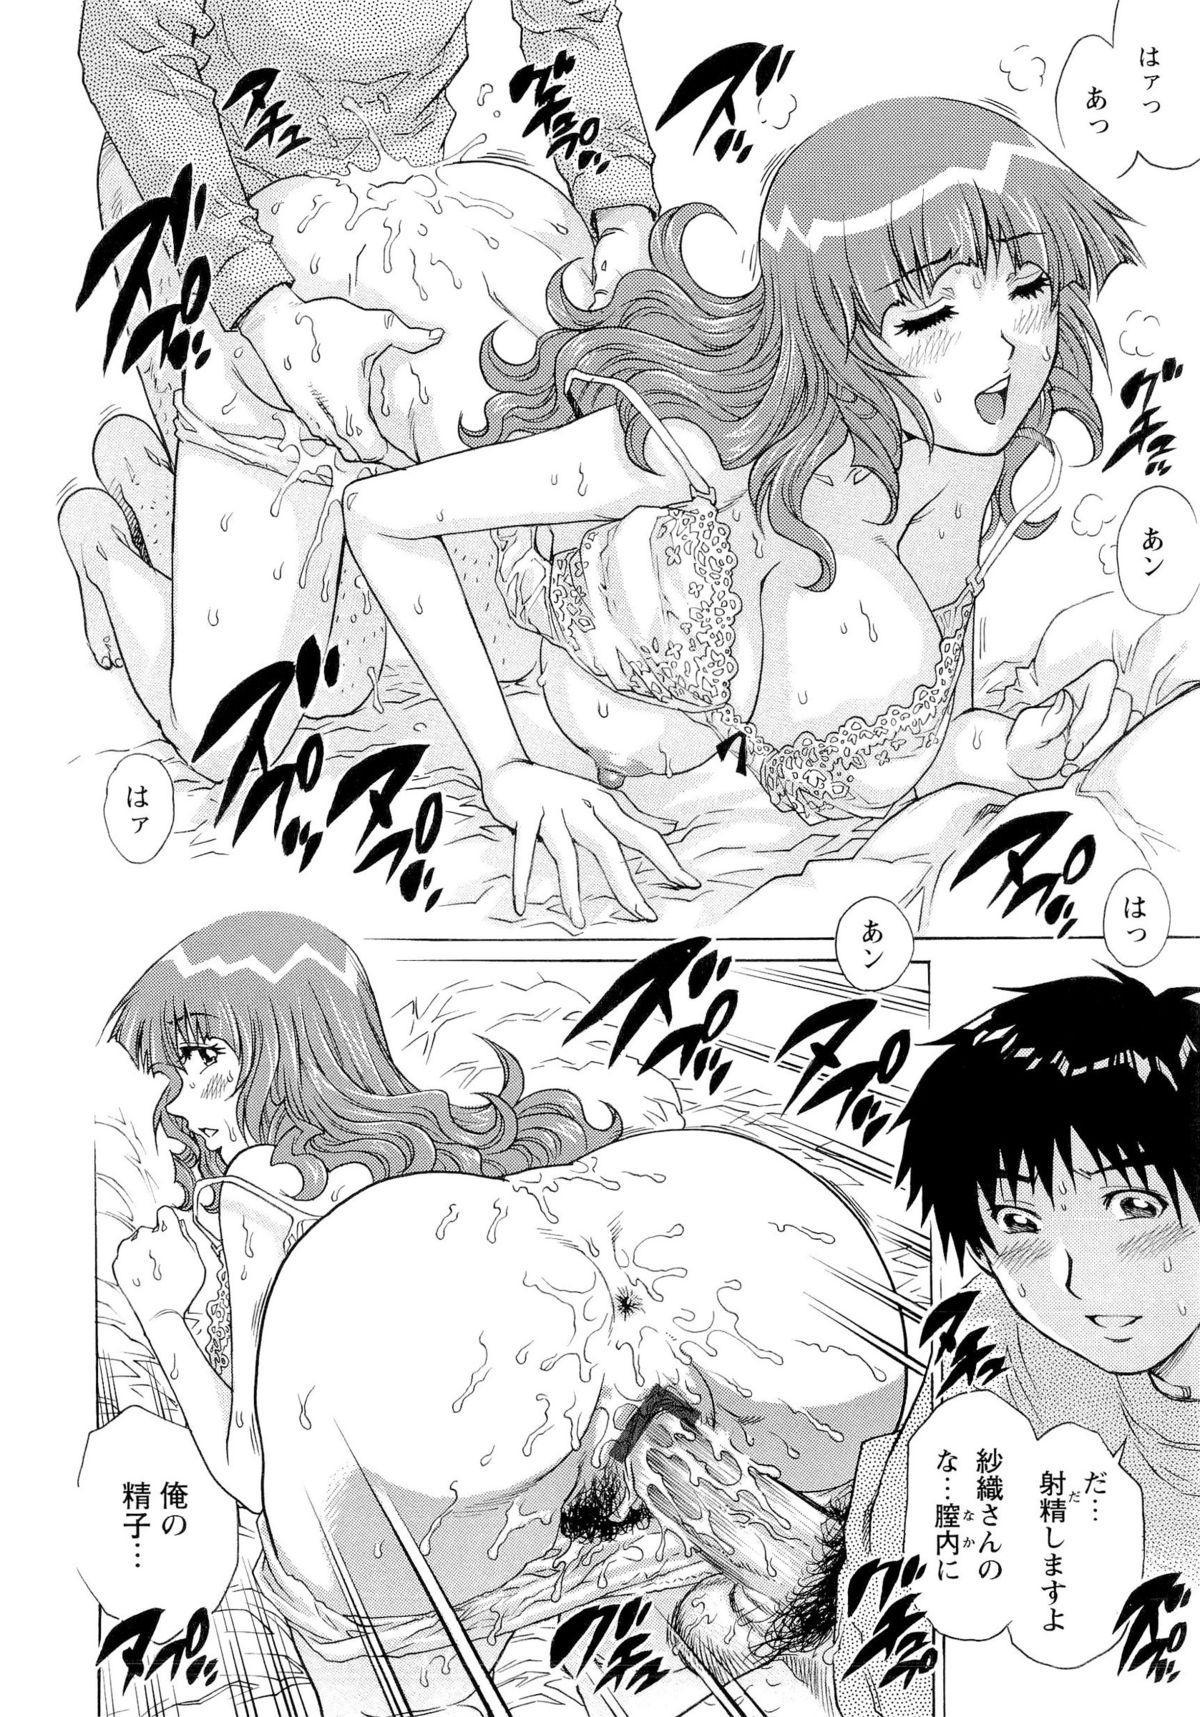 Nureteru Hitozuma - Wetly Wife 20